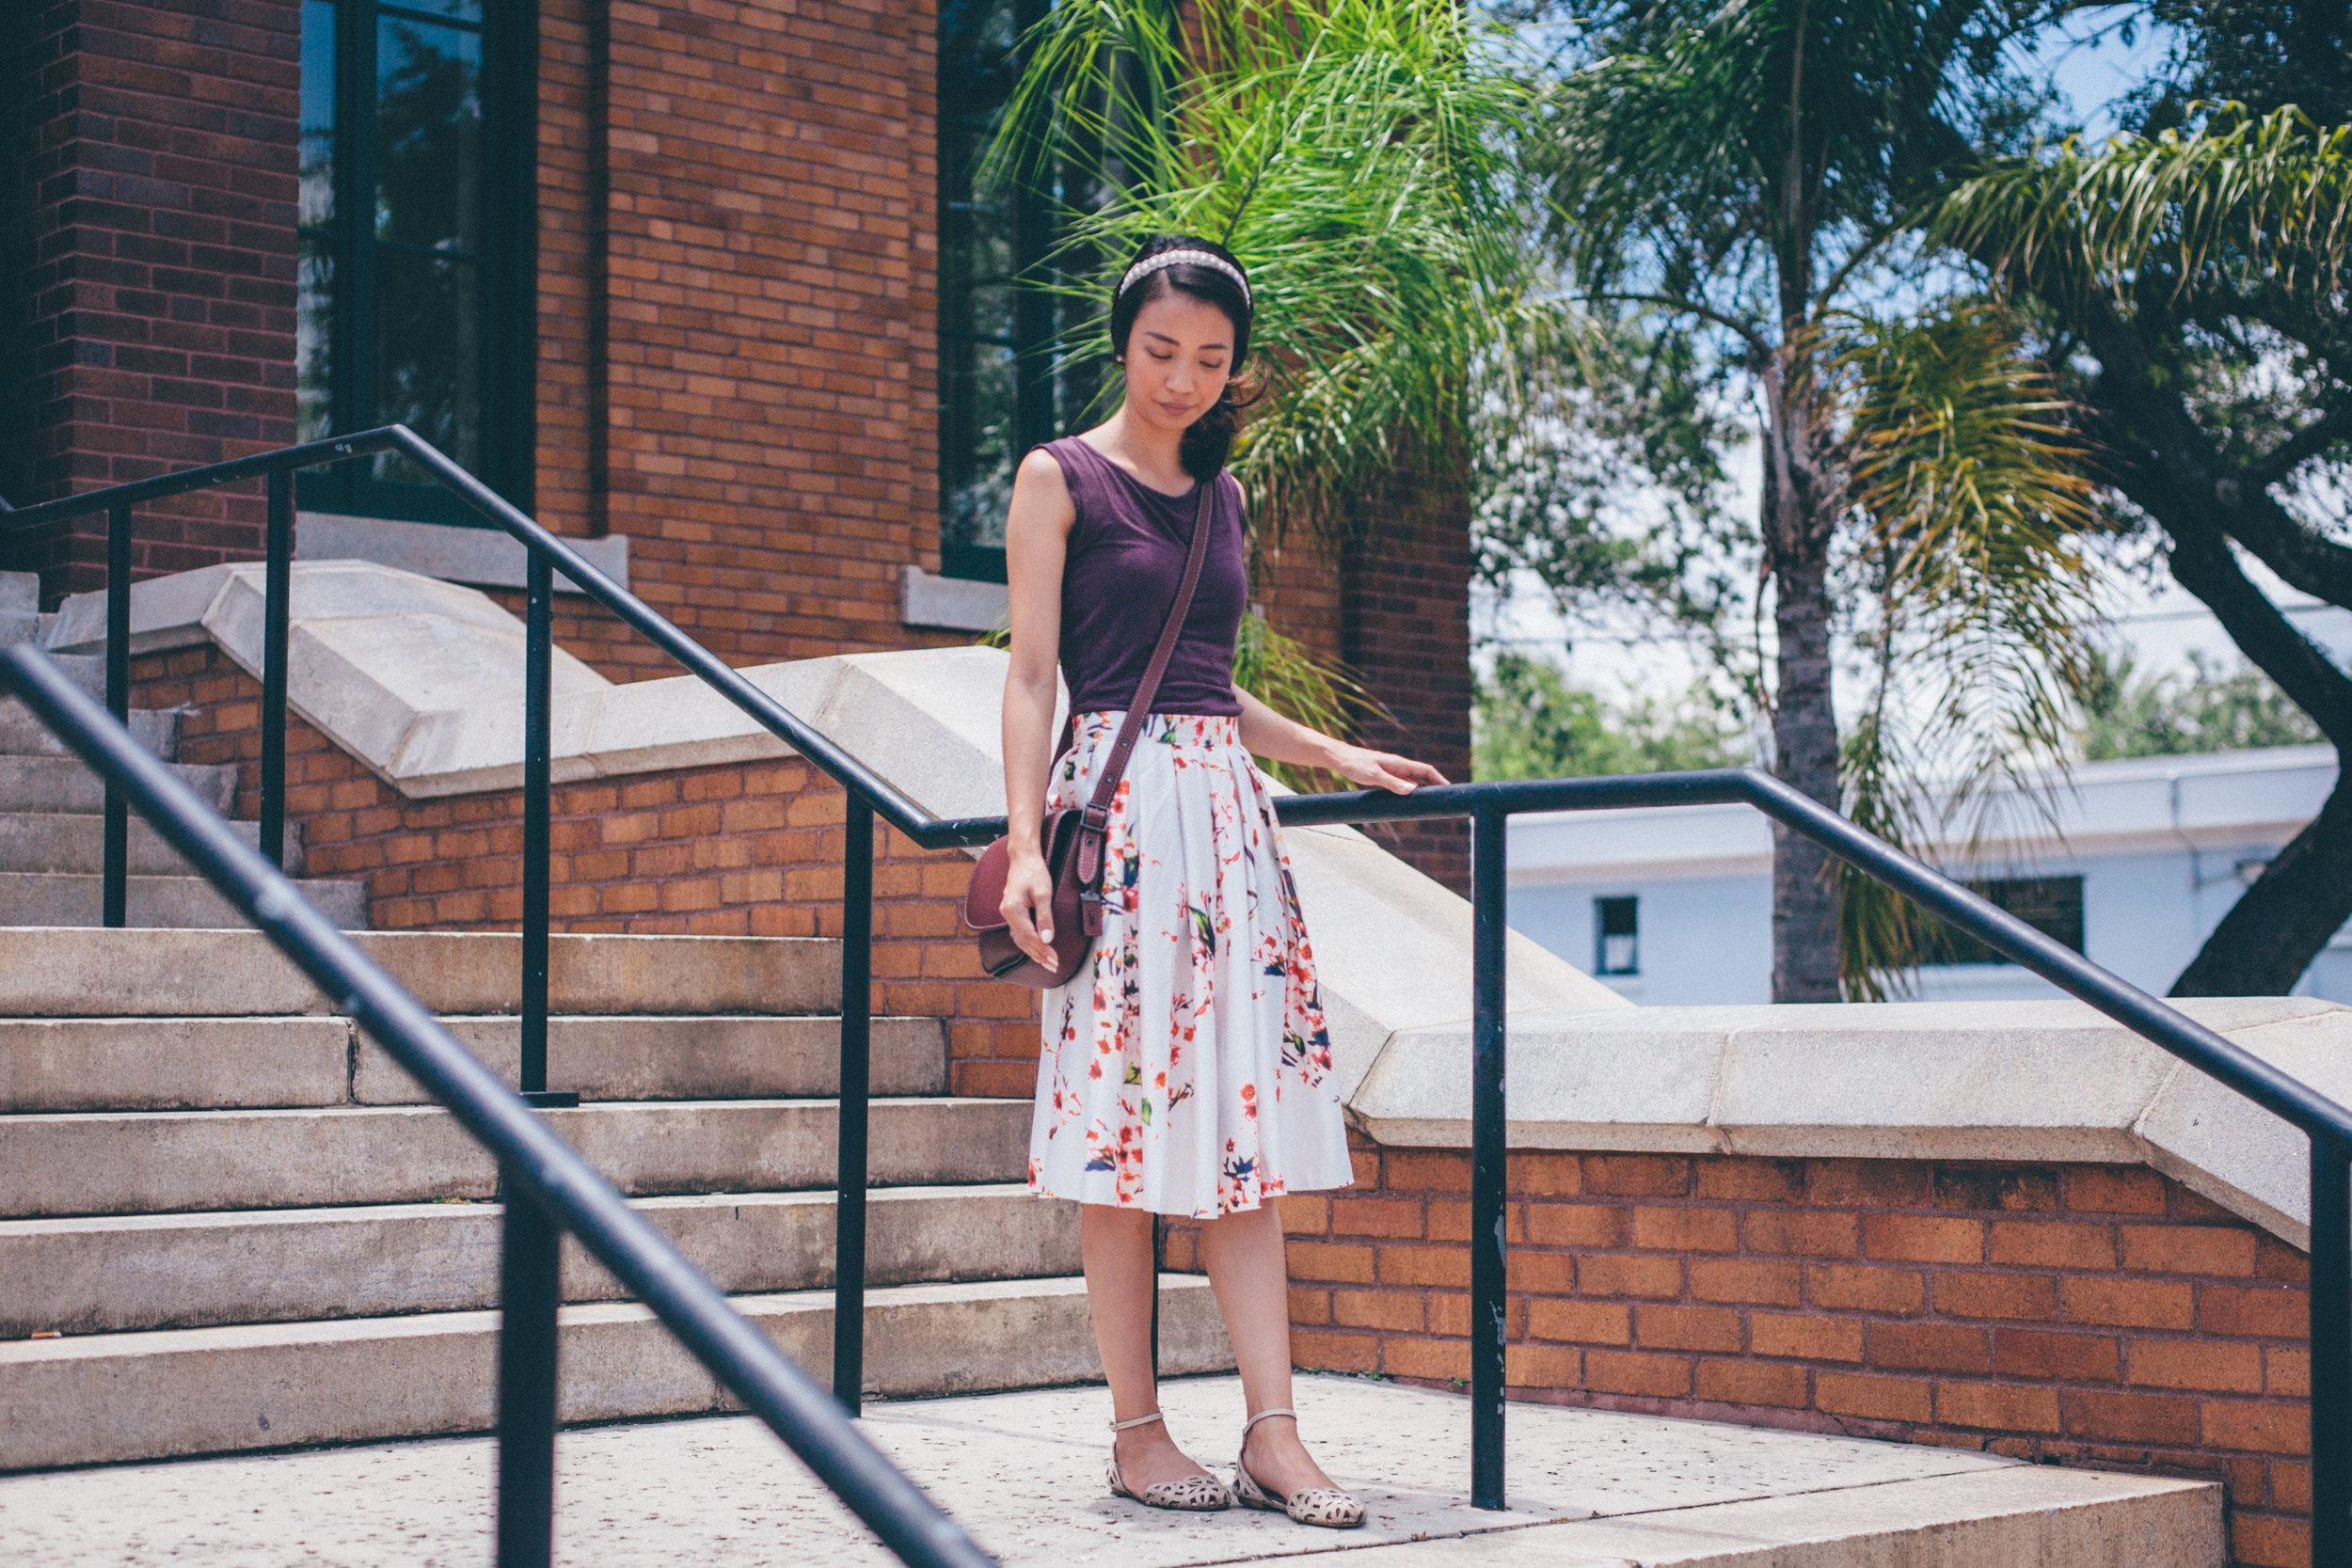 This Jenn Girl - Shein Floral Skirt 1